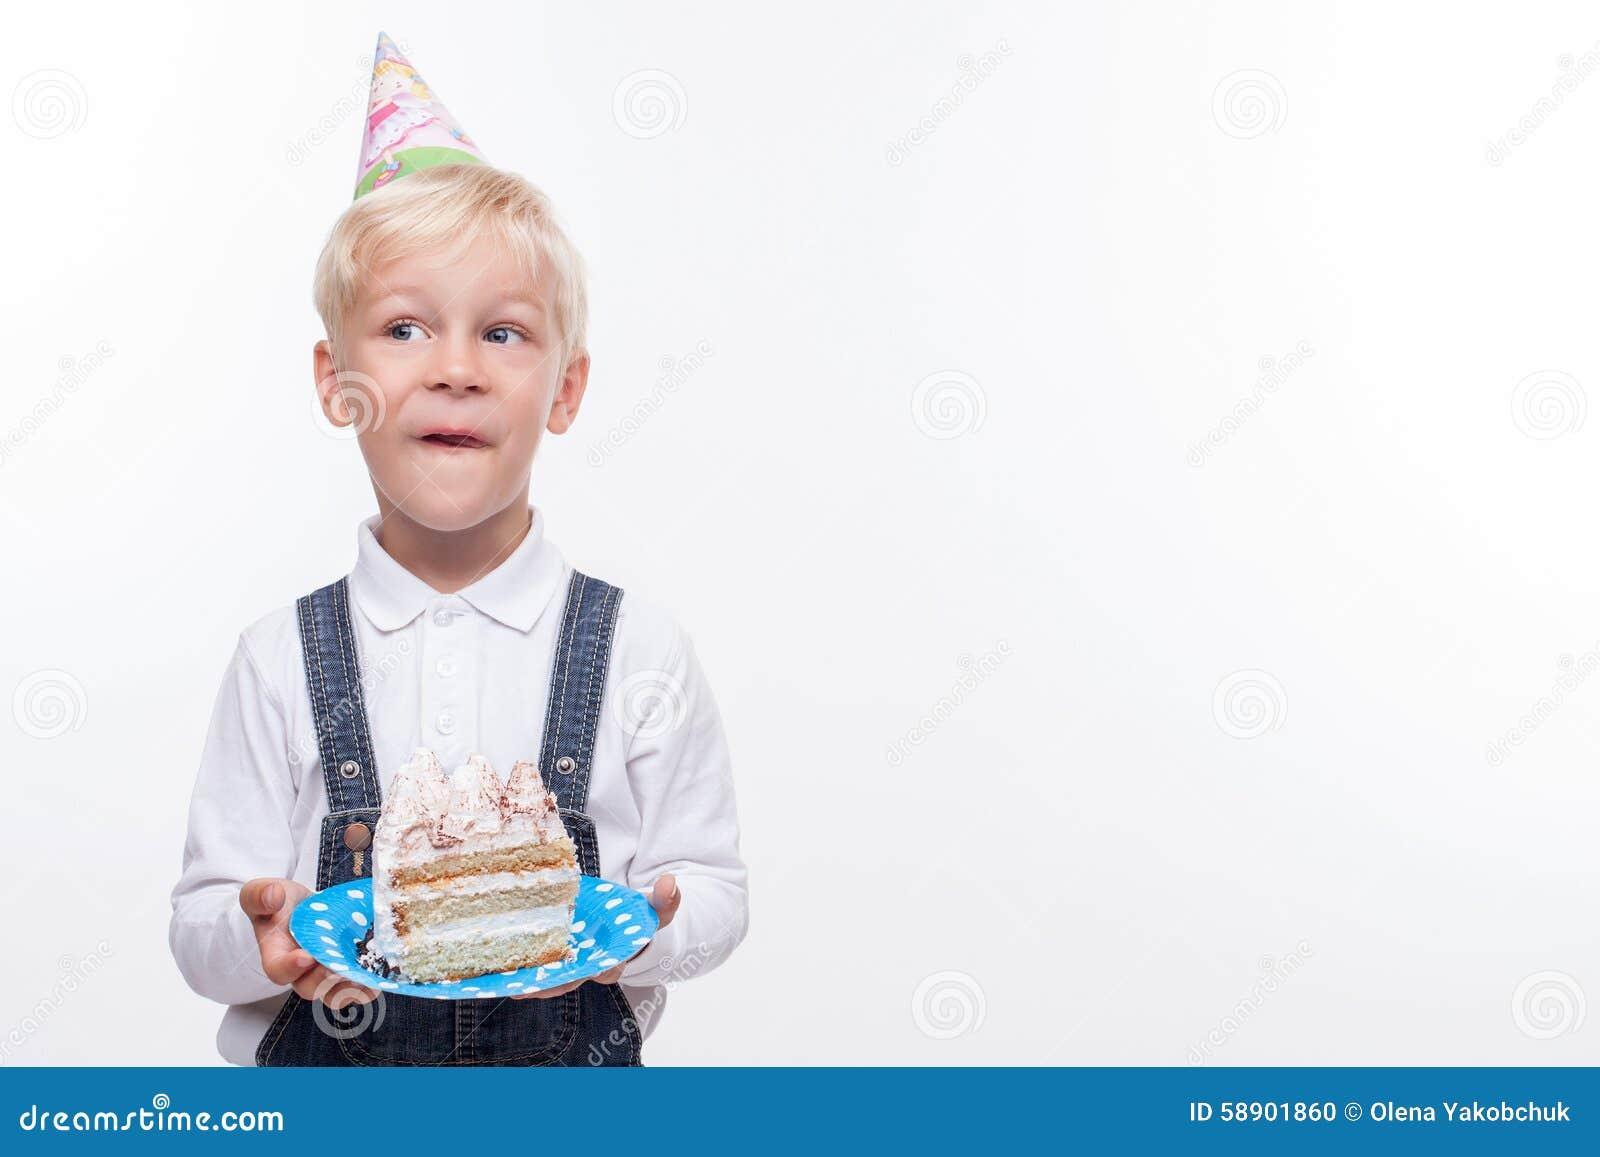 Pretty boy is celebrating his birthday with fun